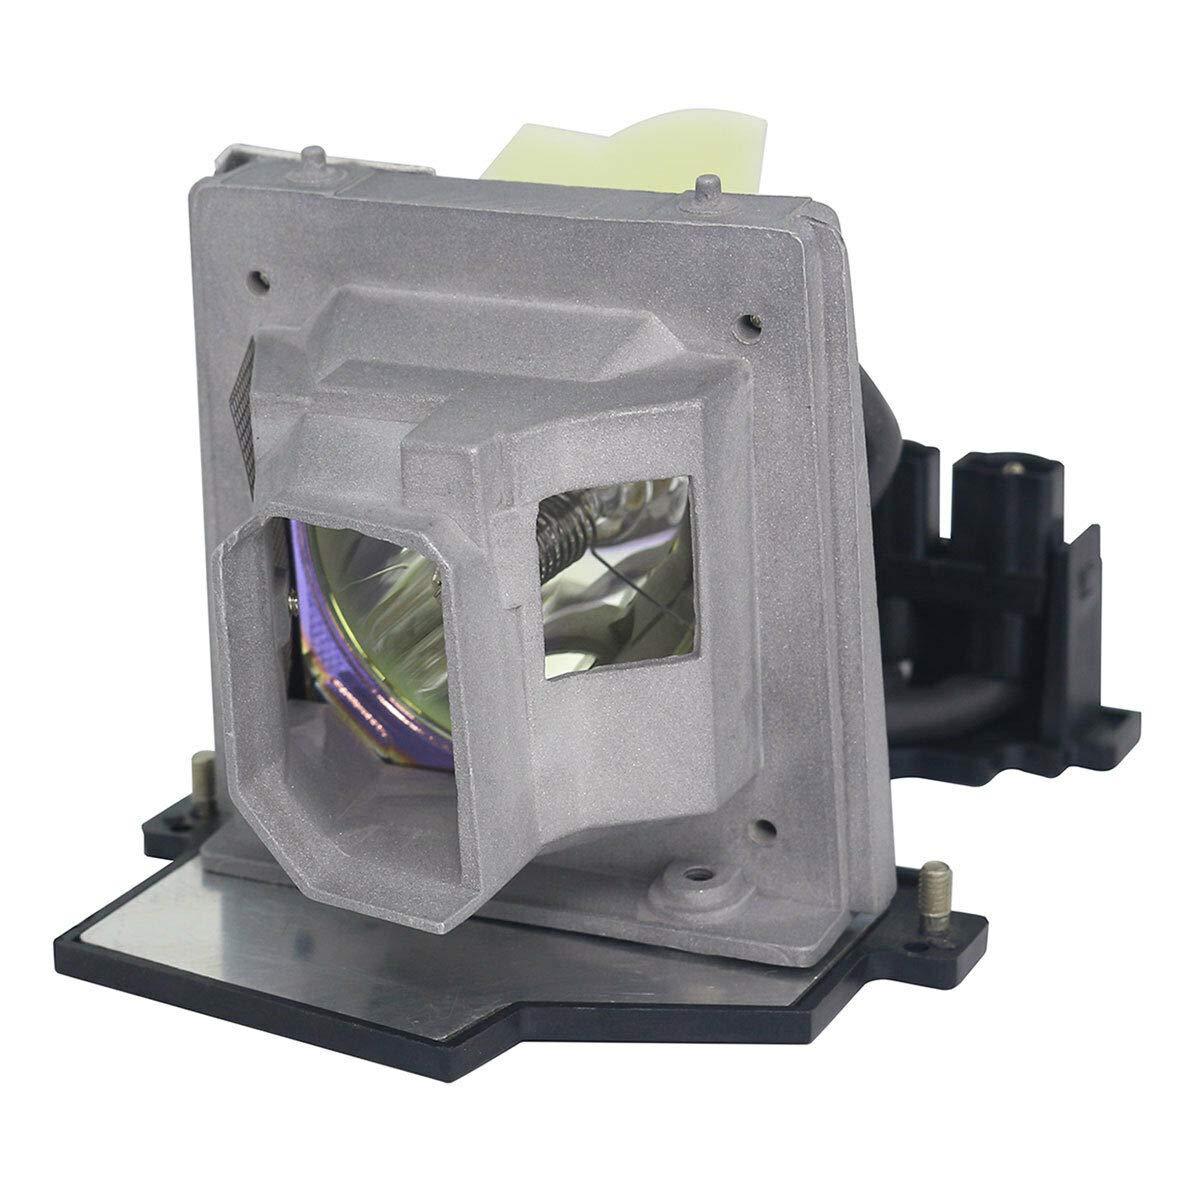 CTLAMP BL-FU200C オリジナルランプバルブ ハウジング付き 対応機種: OPTOMA DS302 / DS303 / DX602 / EP706 / EP706S / EP709 / EP709S / EX990S / EP76S   B07P7V9BG2